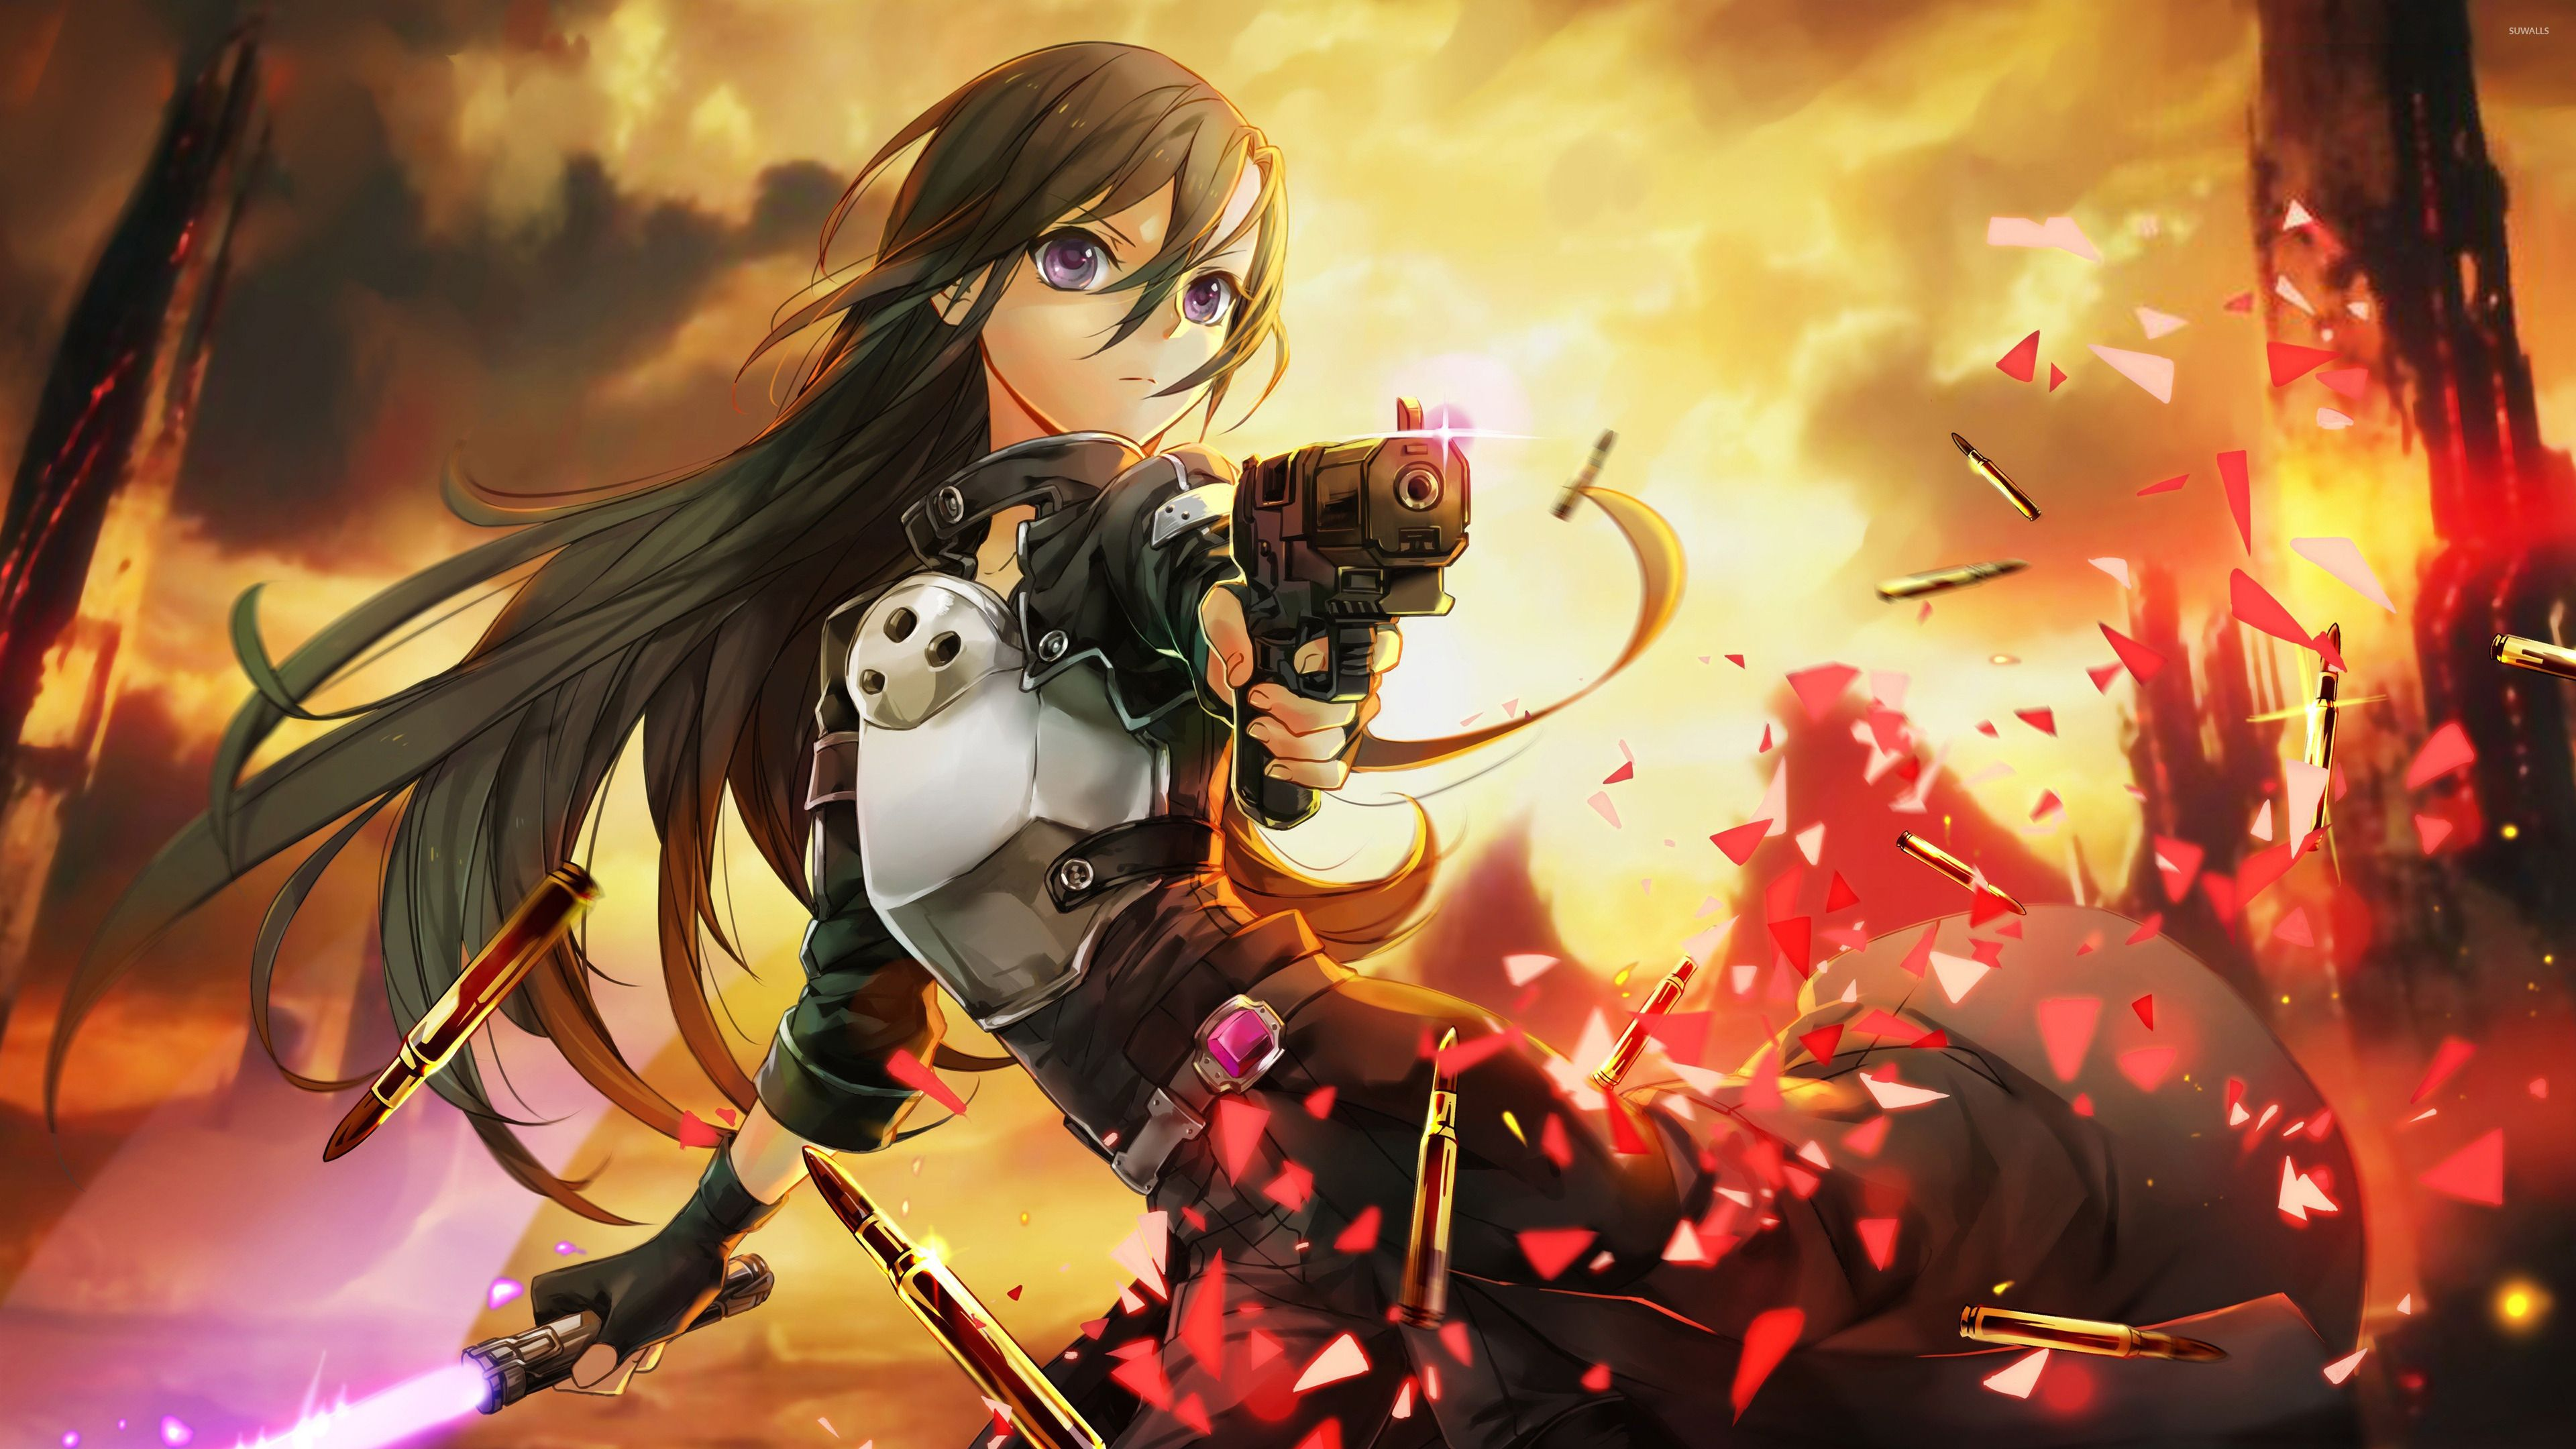 Sao Ggo Other Anime Background Wallpapers On Desktop